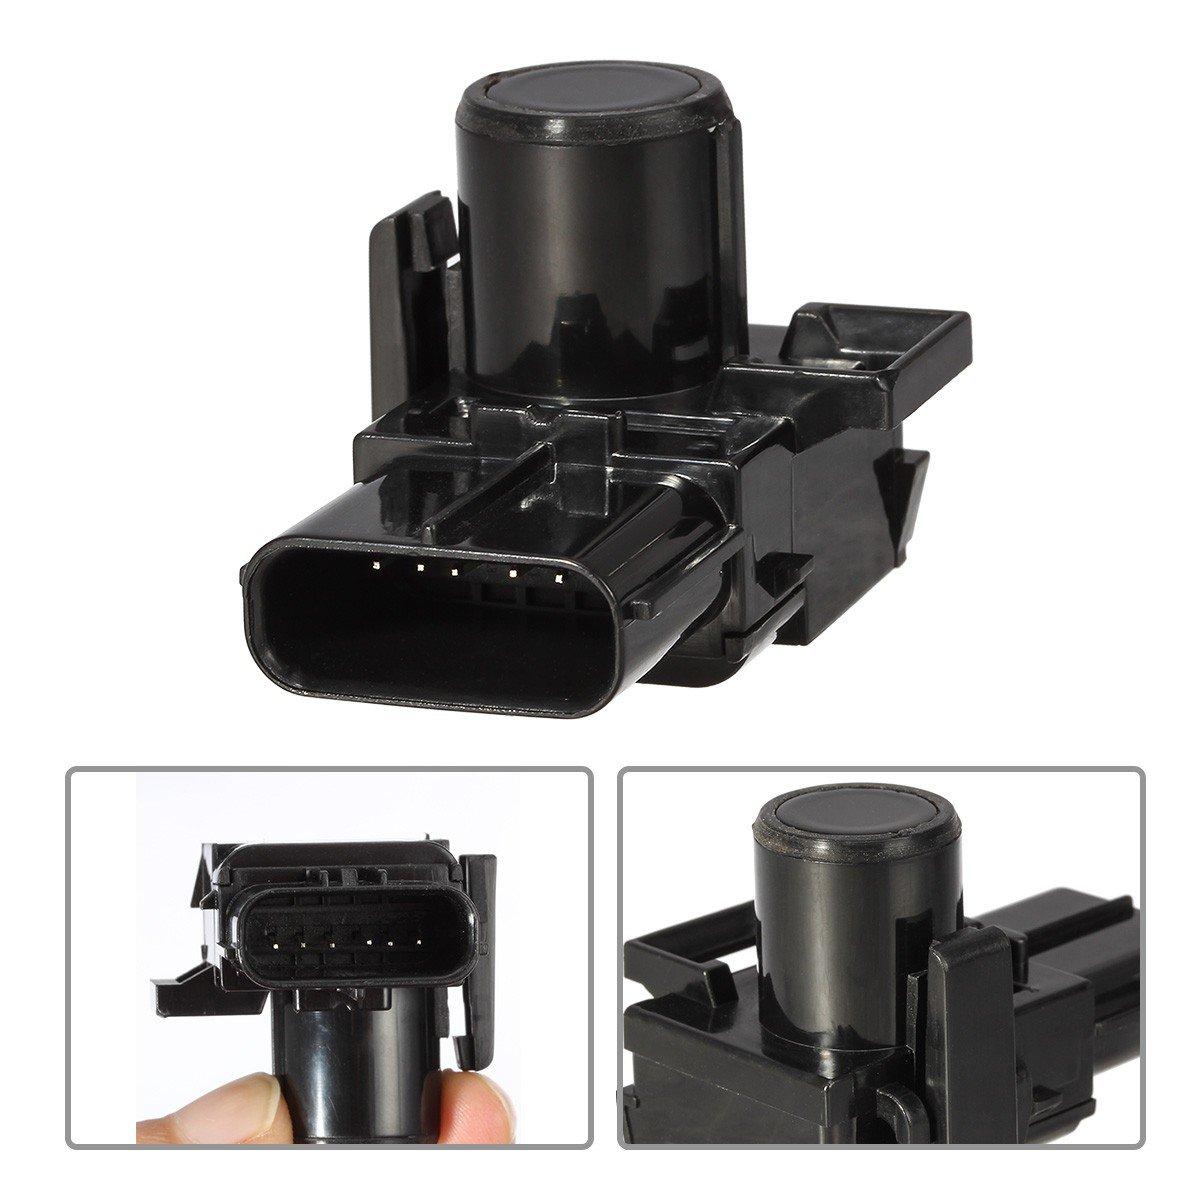 AUTEX 1pc Parking Assist Sensor Compatible with TOYOTA SIENNA 2005-2010